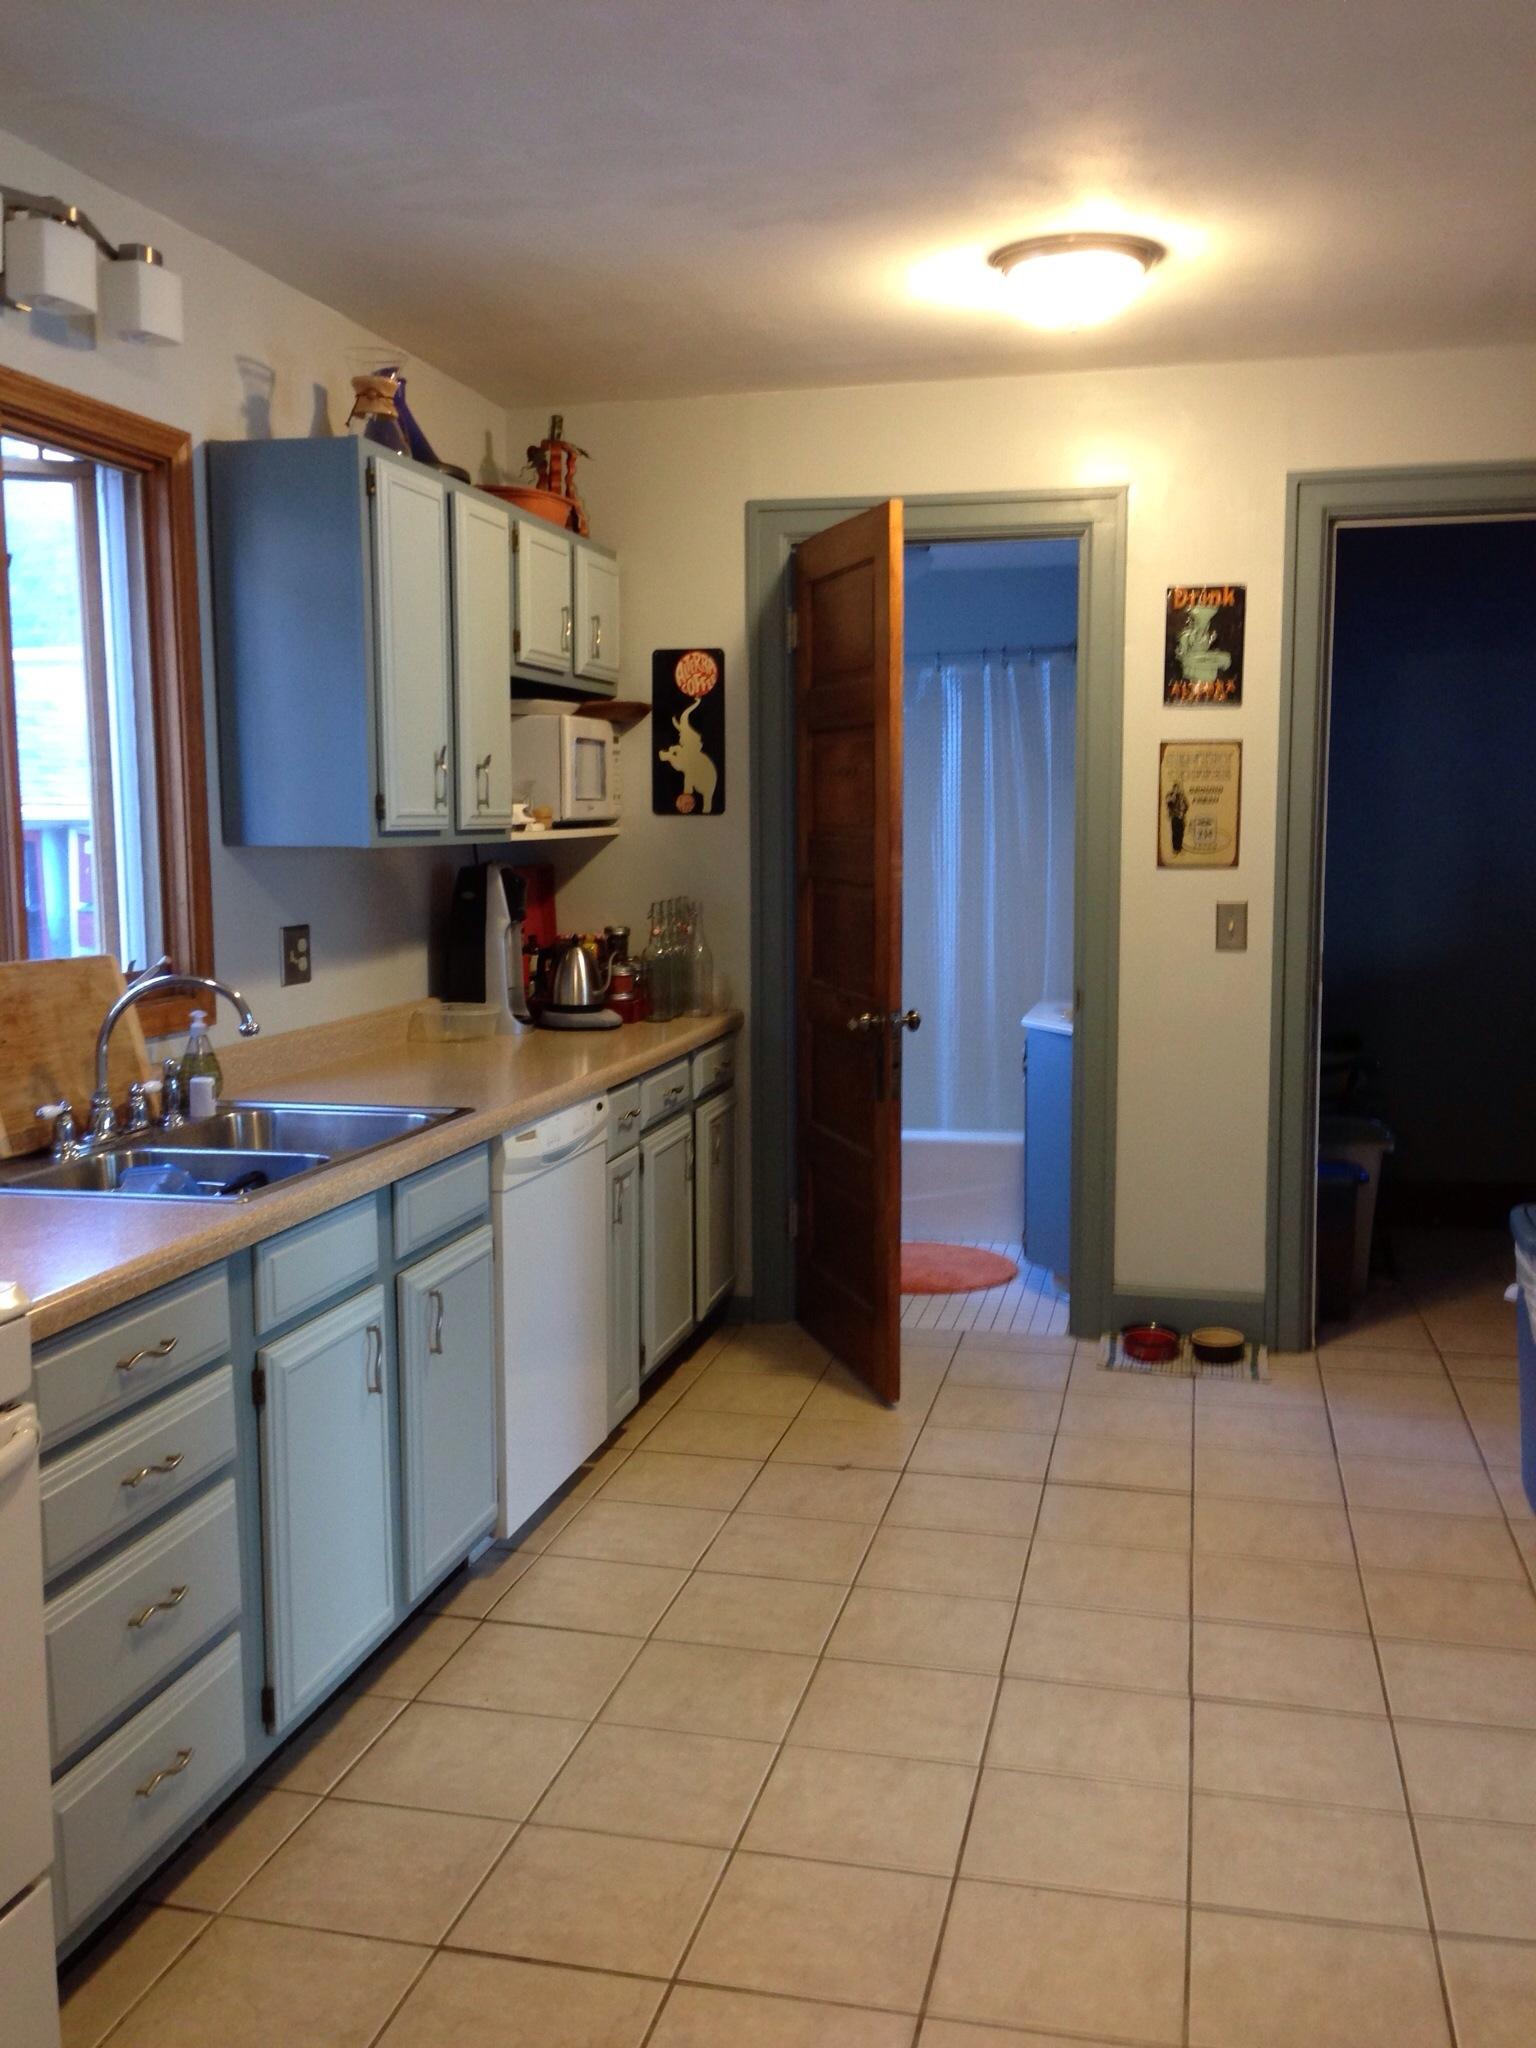 Kitchen Facelift The Interminable Kitchen Facelift Urban Cholita